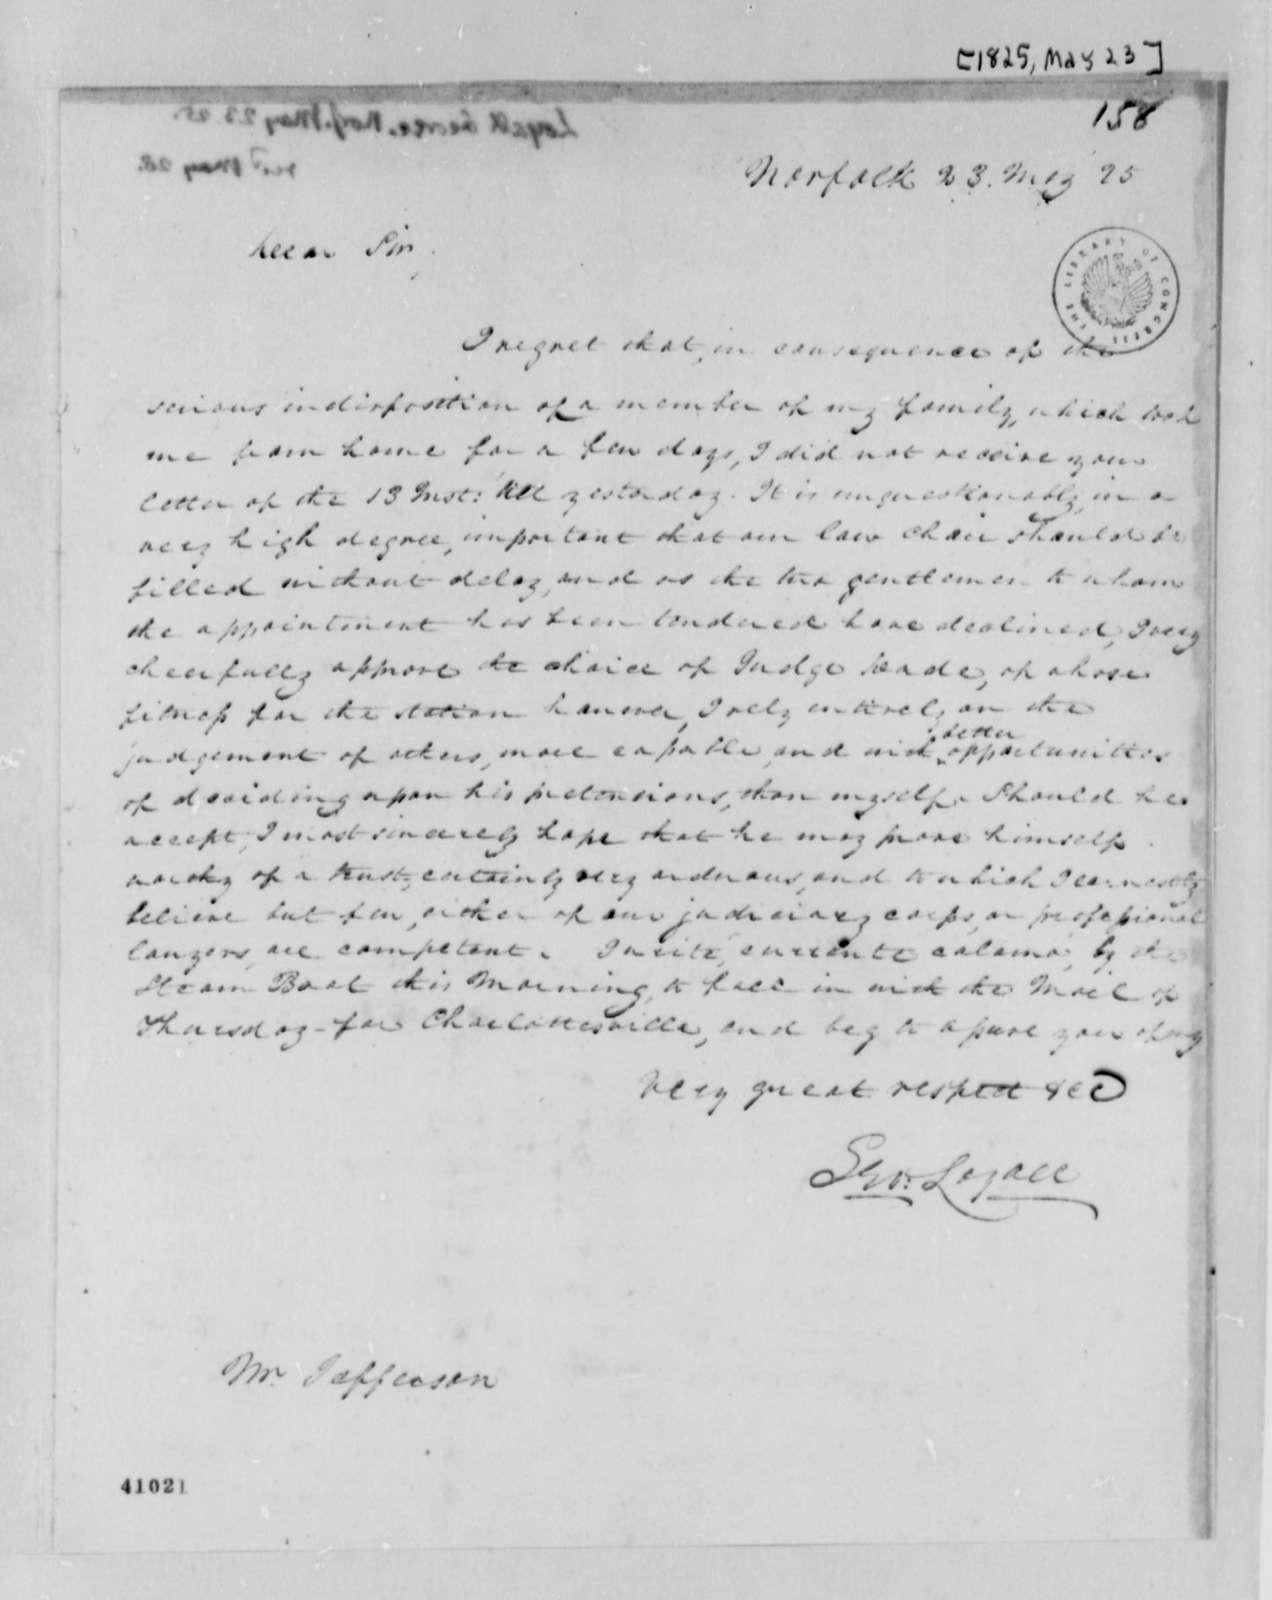 George Loyall to Thomas Jefferson, May 23, 1825